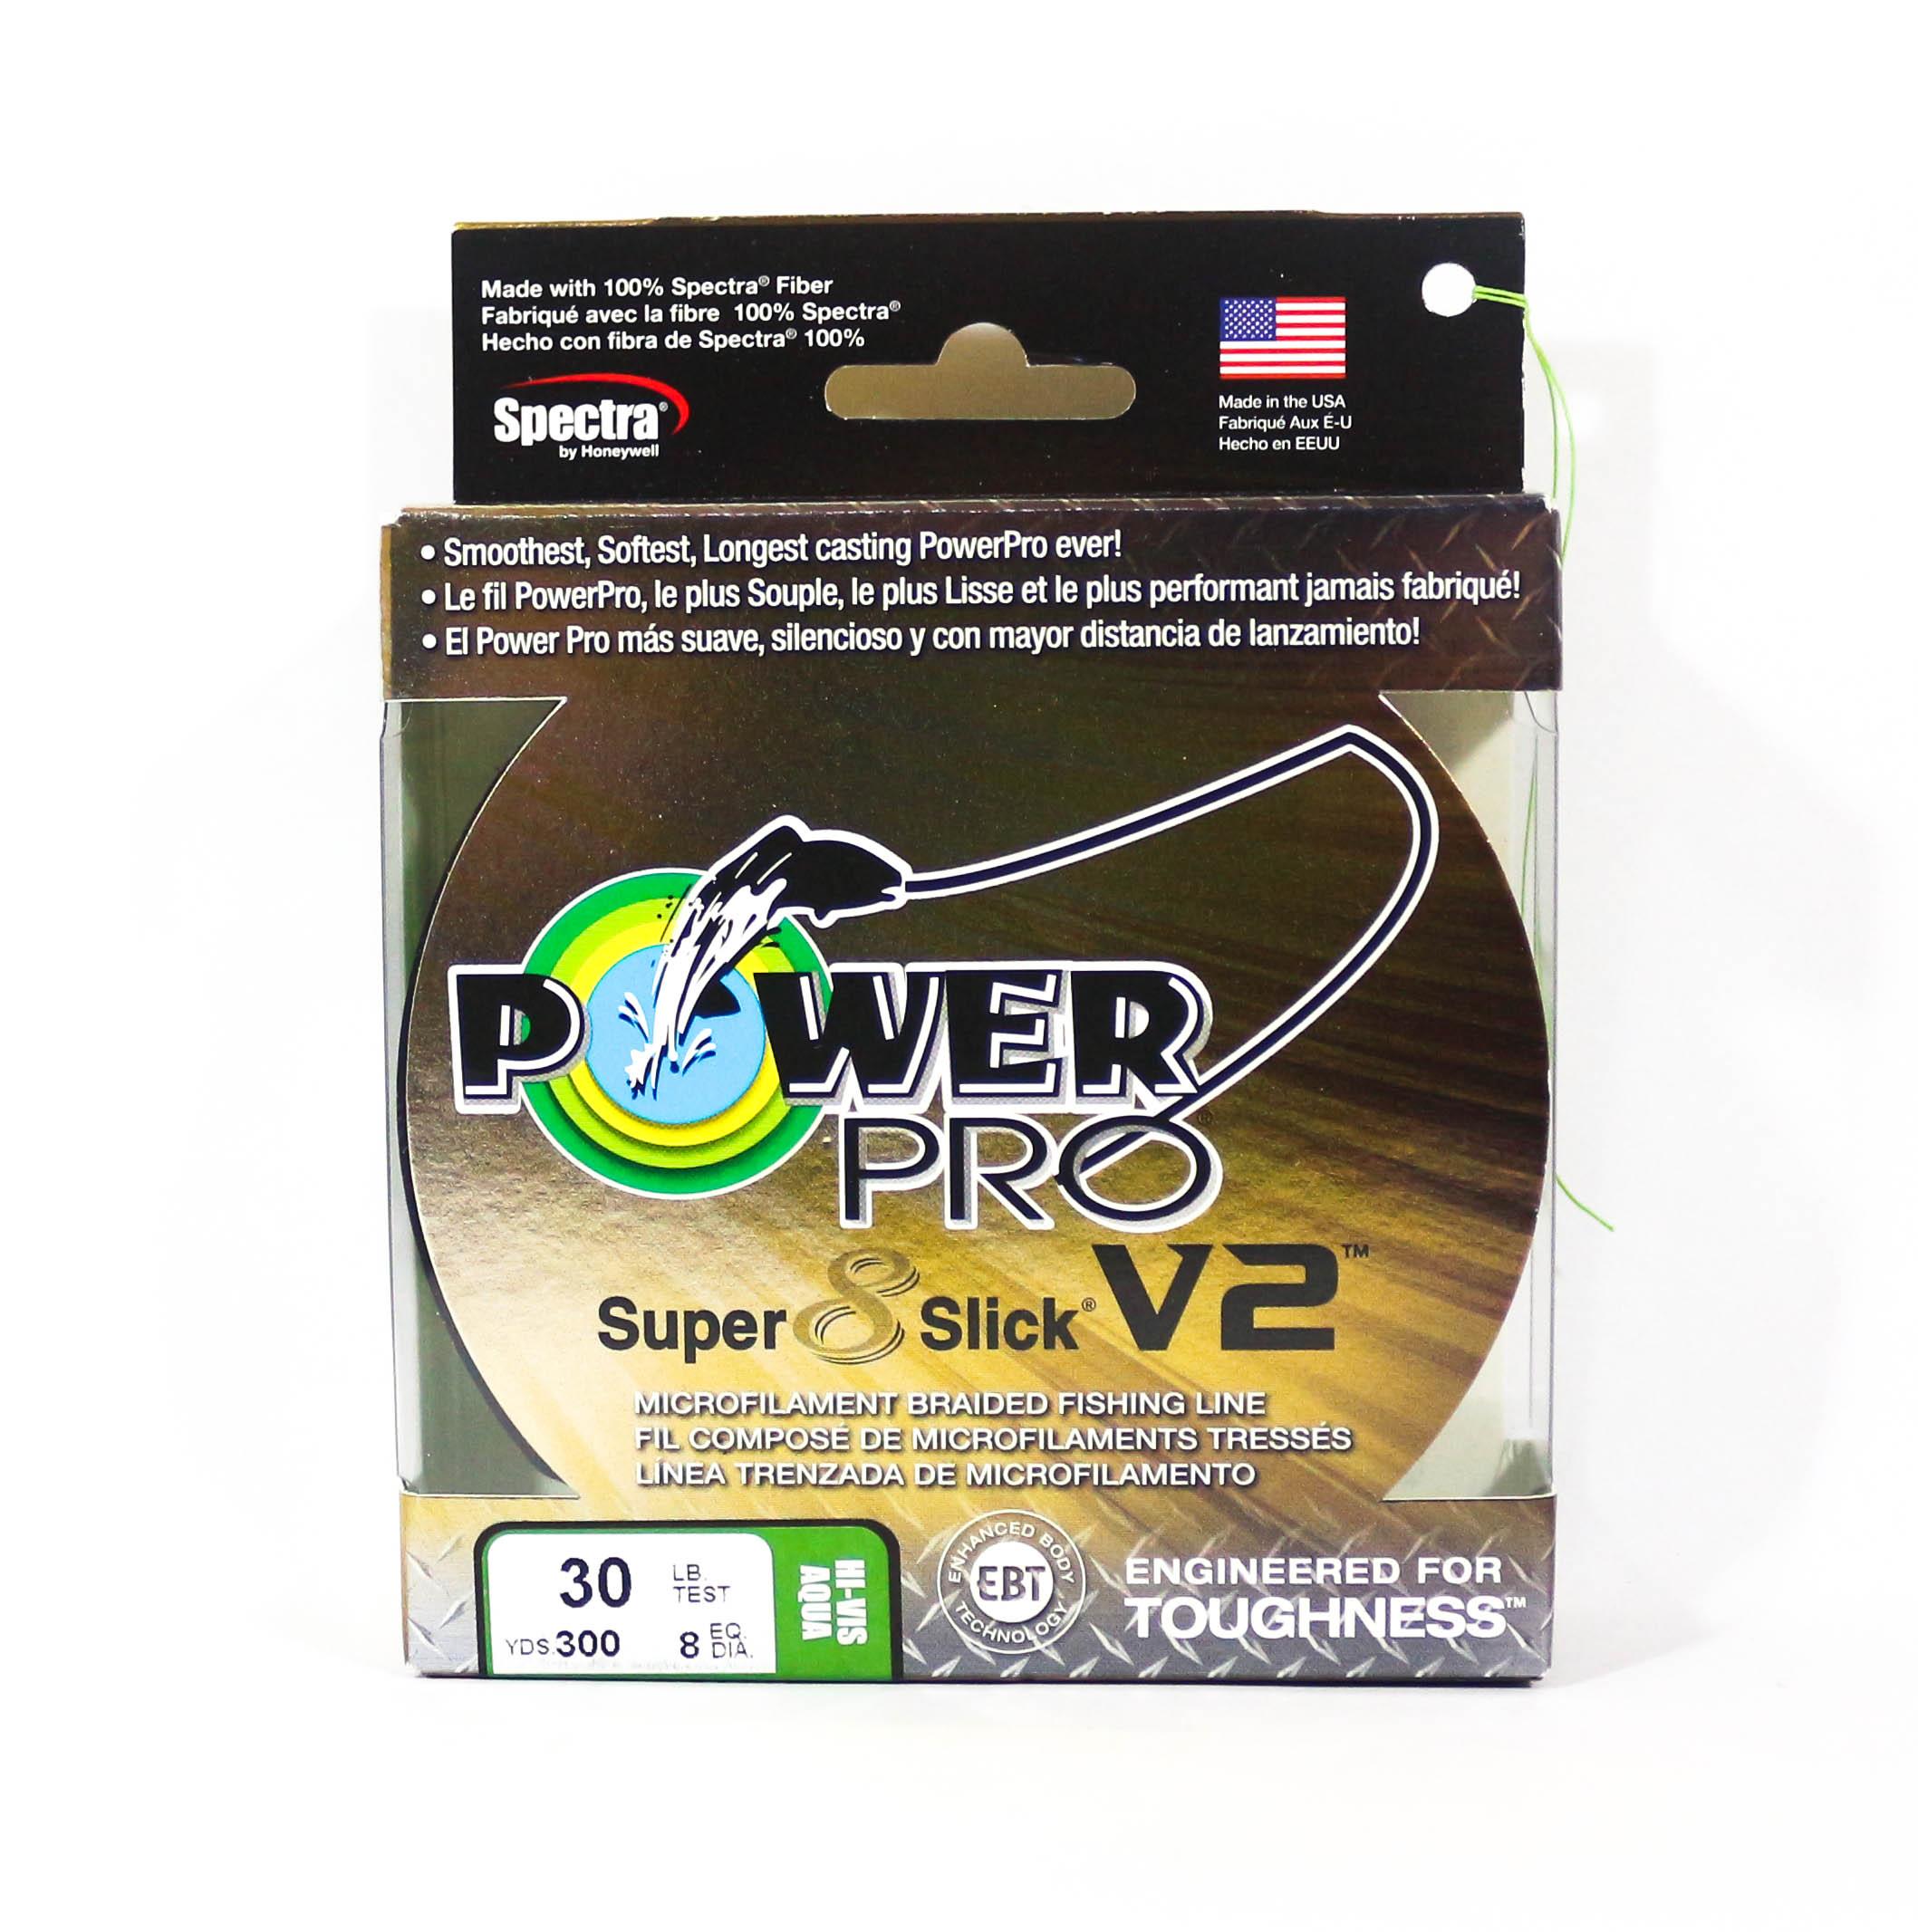 Power Pro Super 8 Slick Version 2 Spectra Line 30lb by 300yds Aqua (8219)